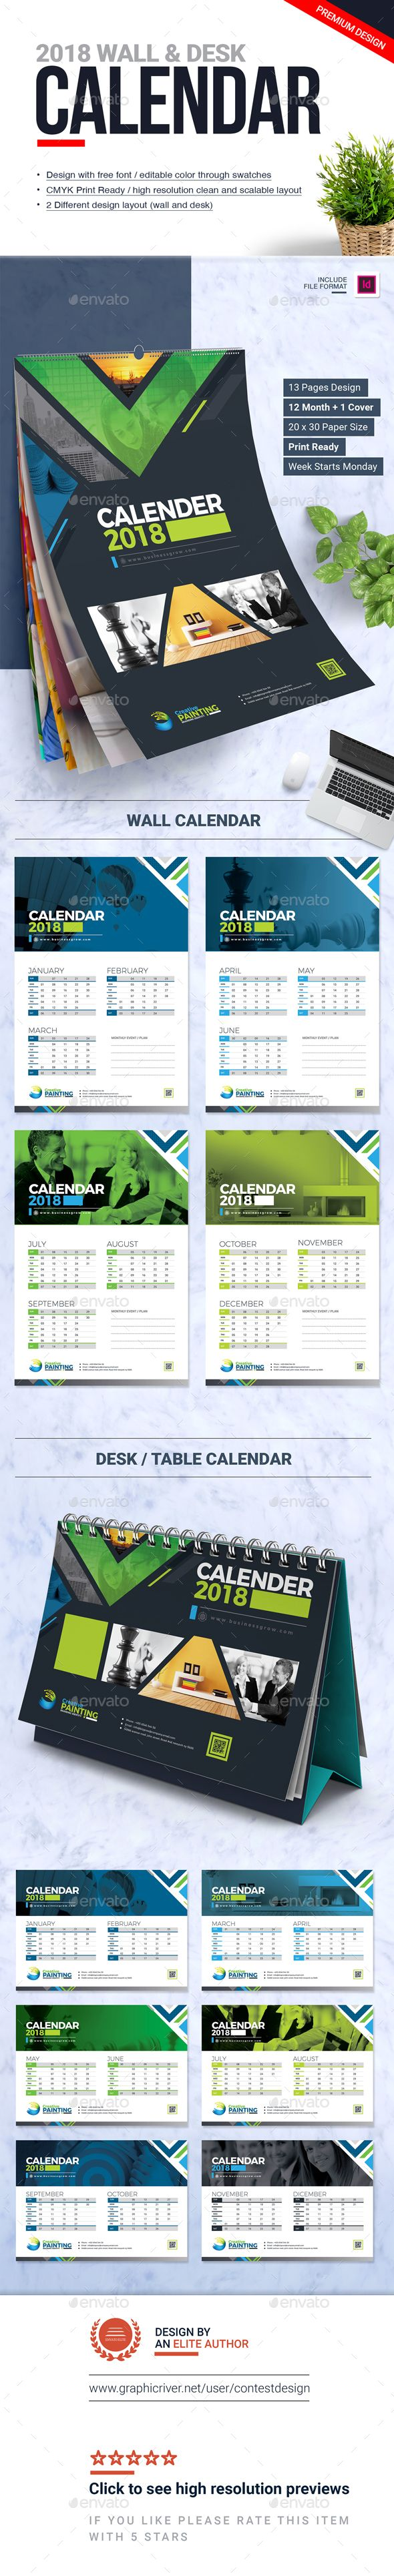 2018 Calendar Design Template InDesign INDD | Wall and Desk / Table Calendar 2018